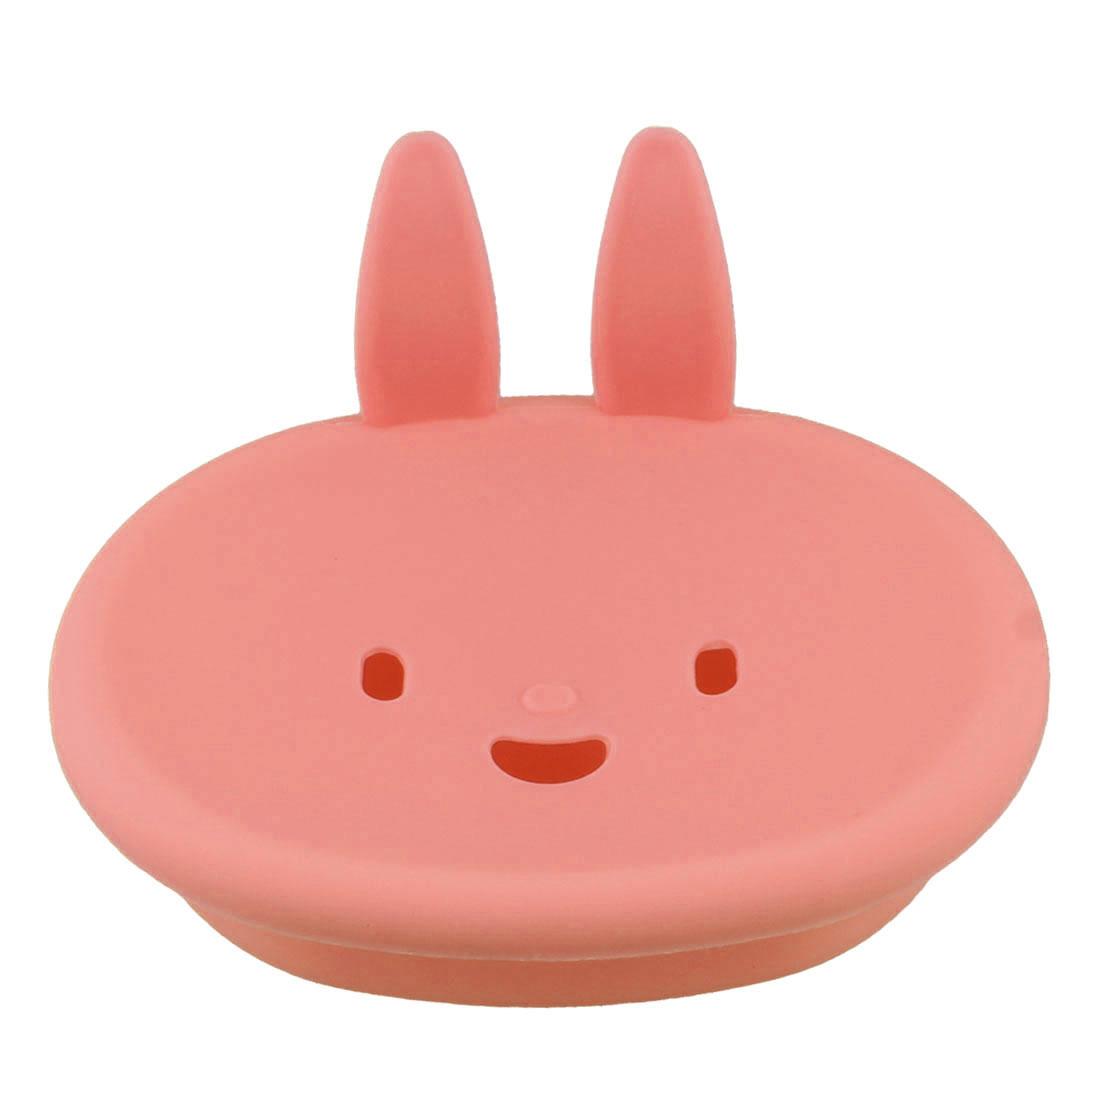 Bathroom Rabbit Design Pink Plastic Fancy Soap Holder Case Box Tray